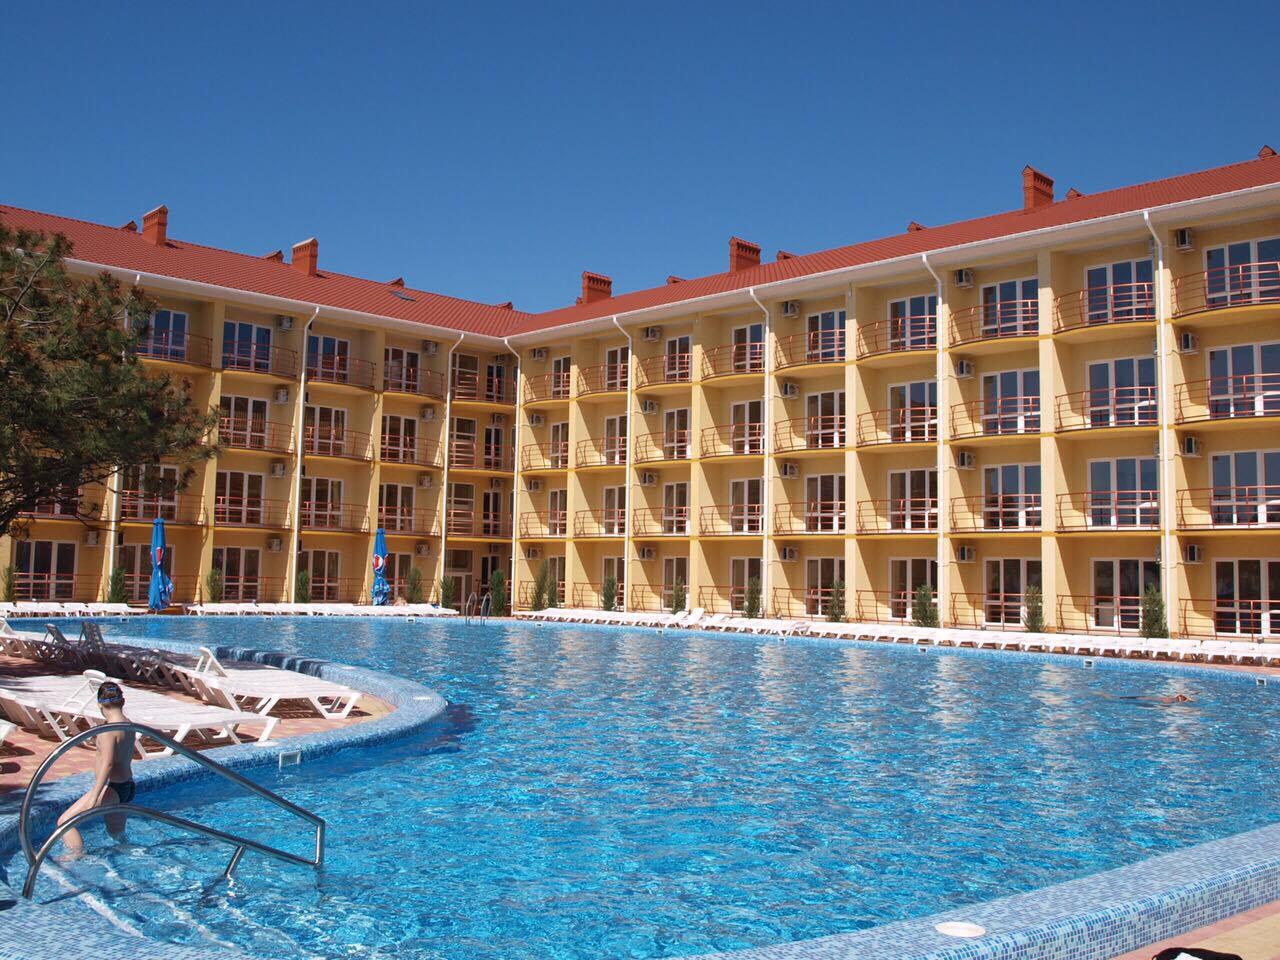 Пансионат Бриз де Люкс Каролино-Бугаз бассейн и отель фото